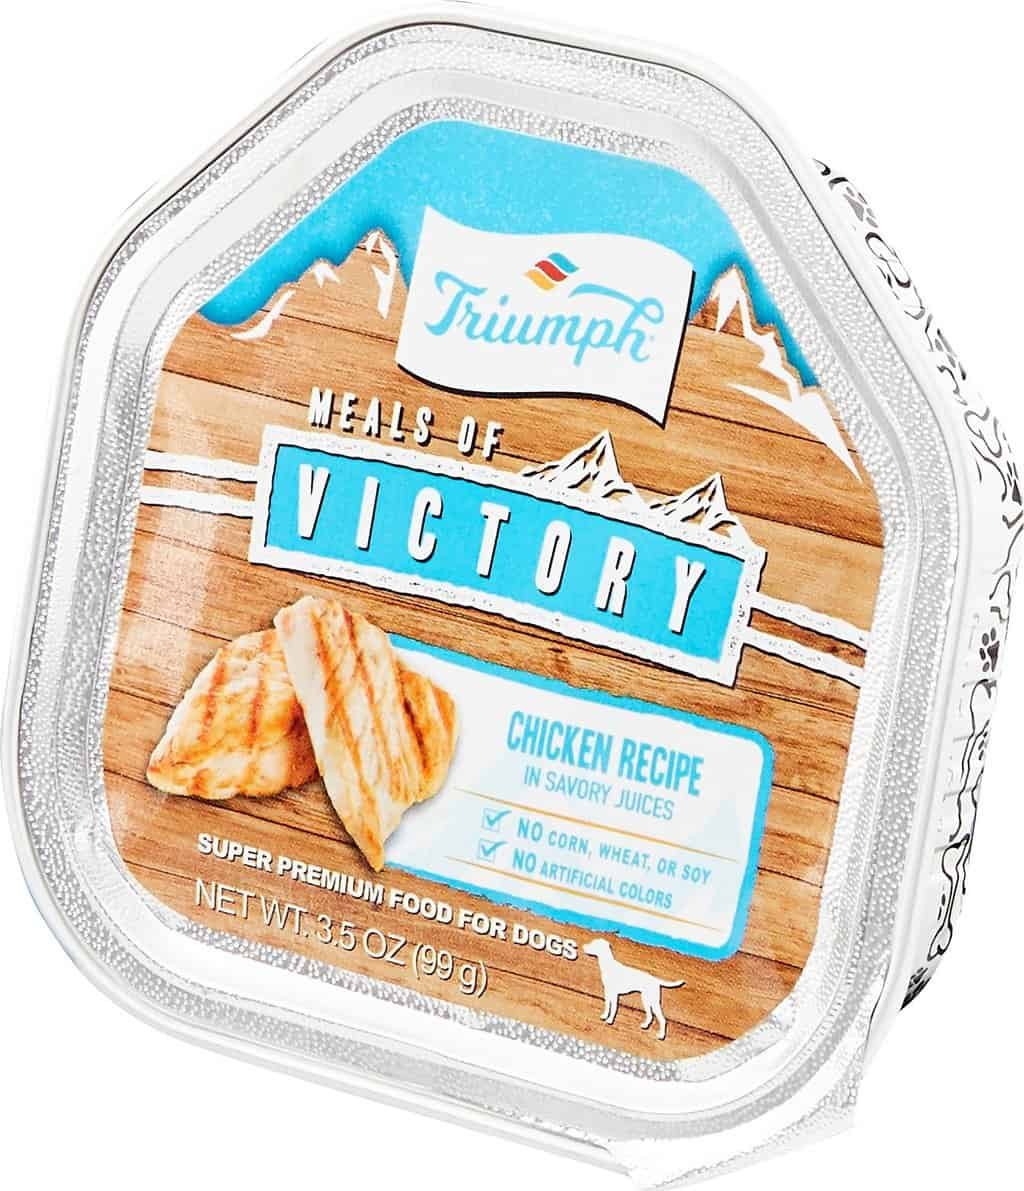 Triumph Dog Food Review 2021: Best Affordable Premium Dog Food? 17